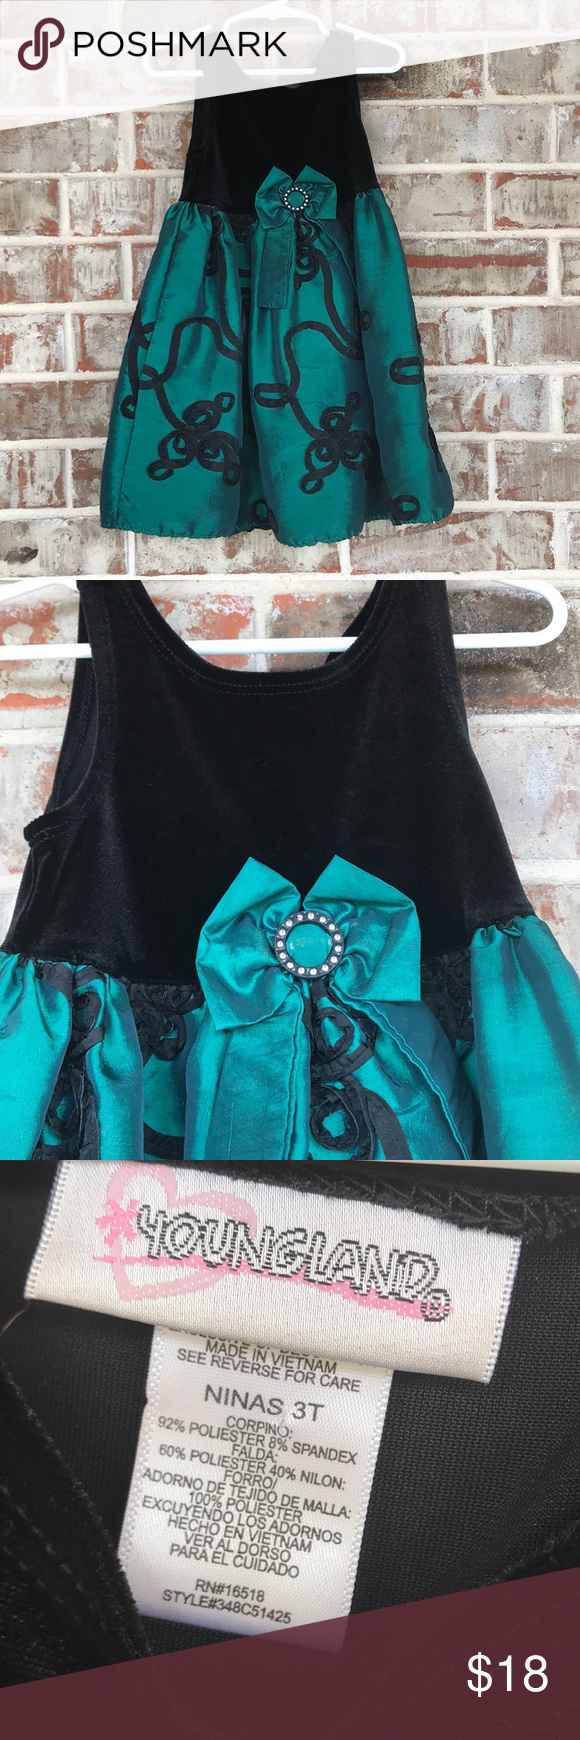 3t Youngland Dressy Green And Black Dress Black Dress Dressy Fashion [ 1740 x 580 Pixel ]